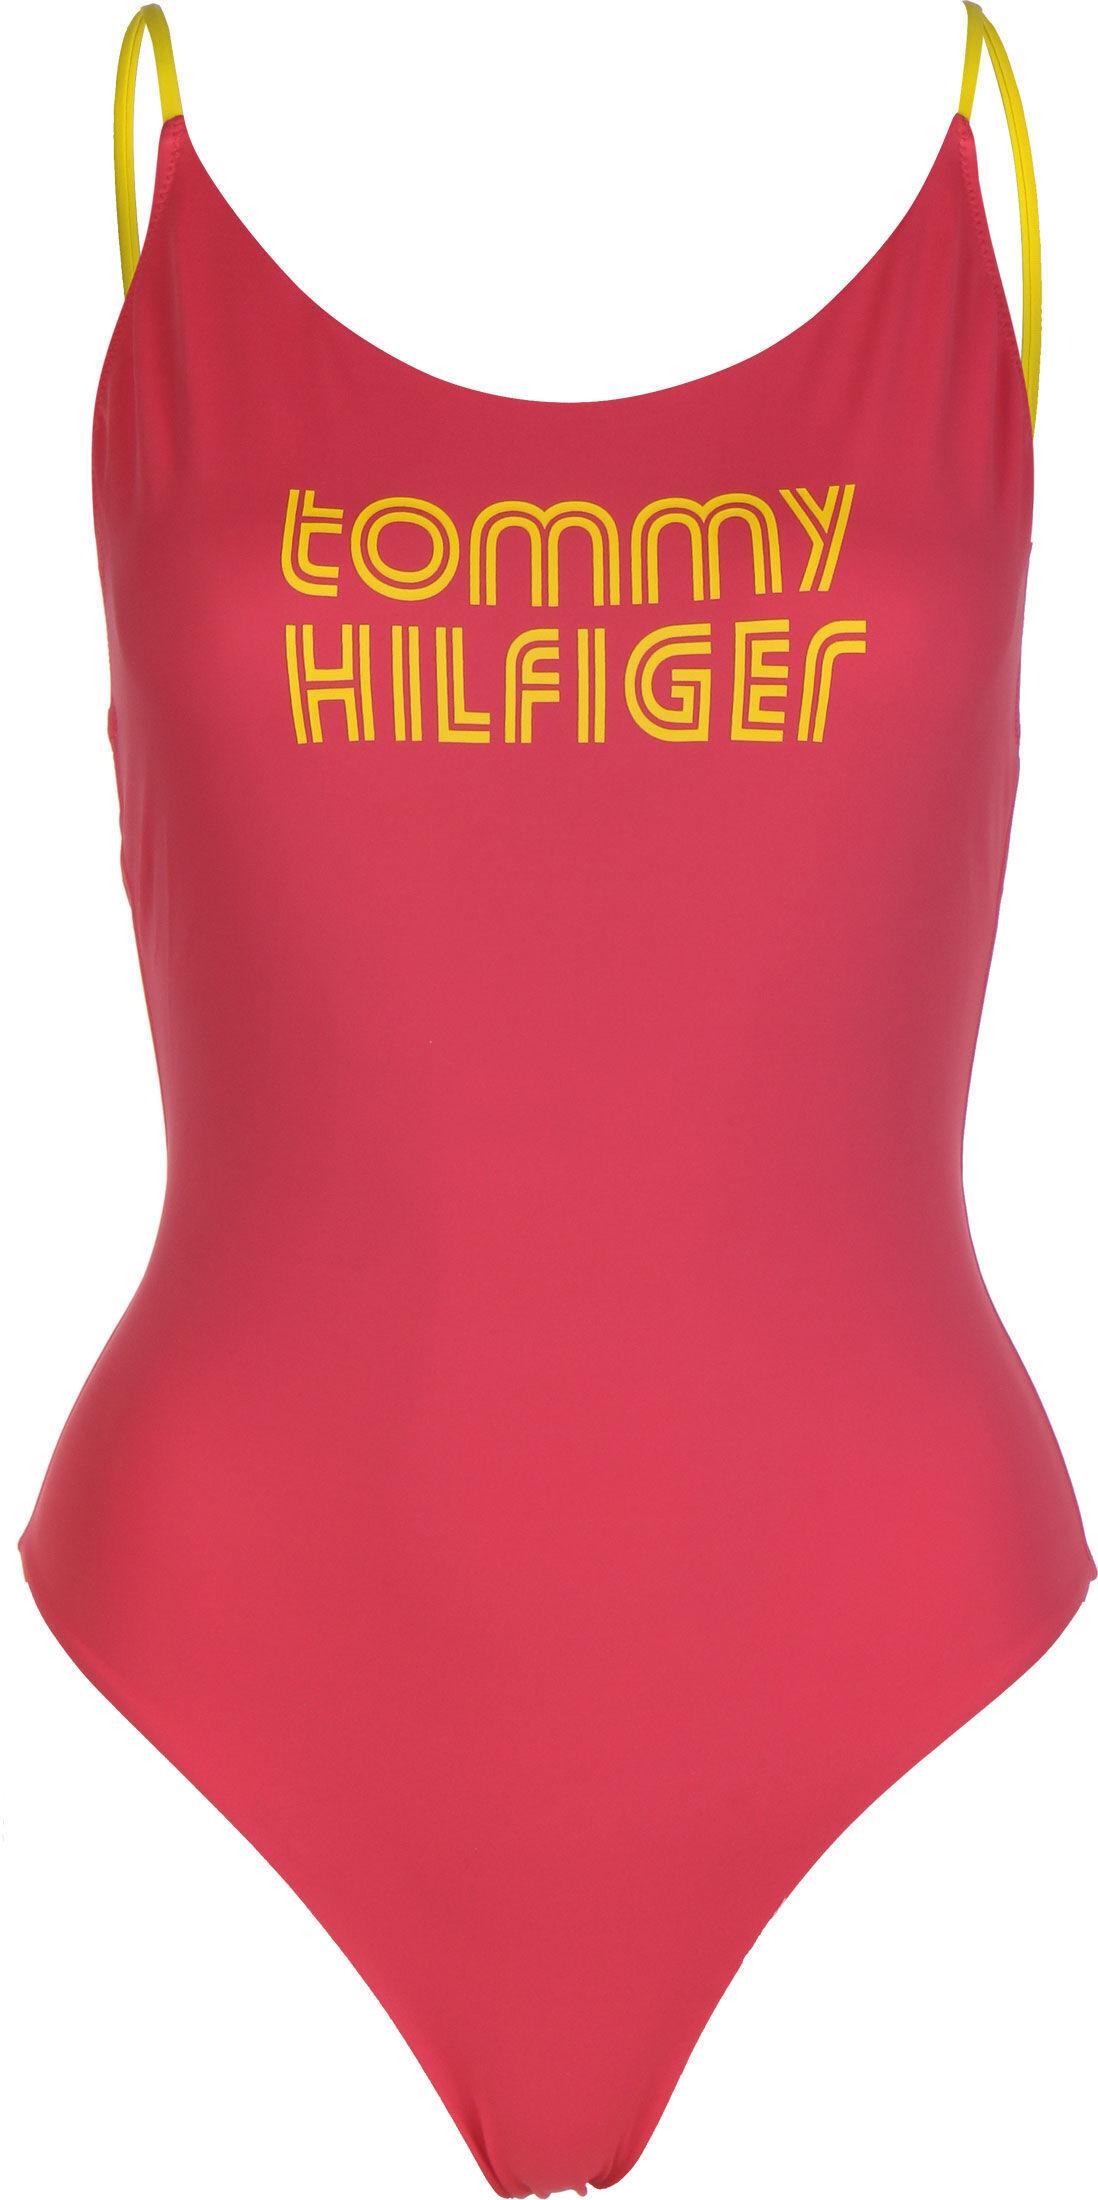 Tommy Hilfiger maillot de bain, M, femme rose